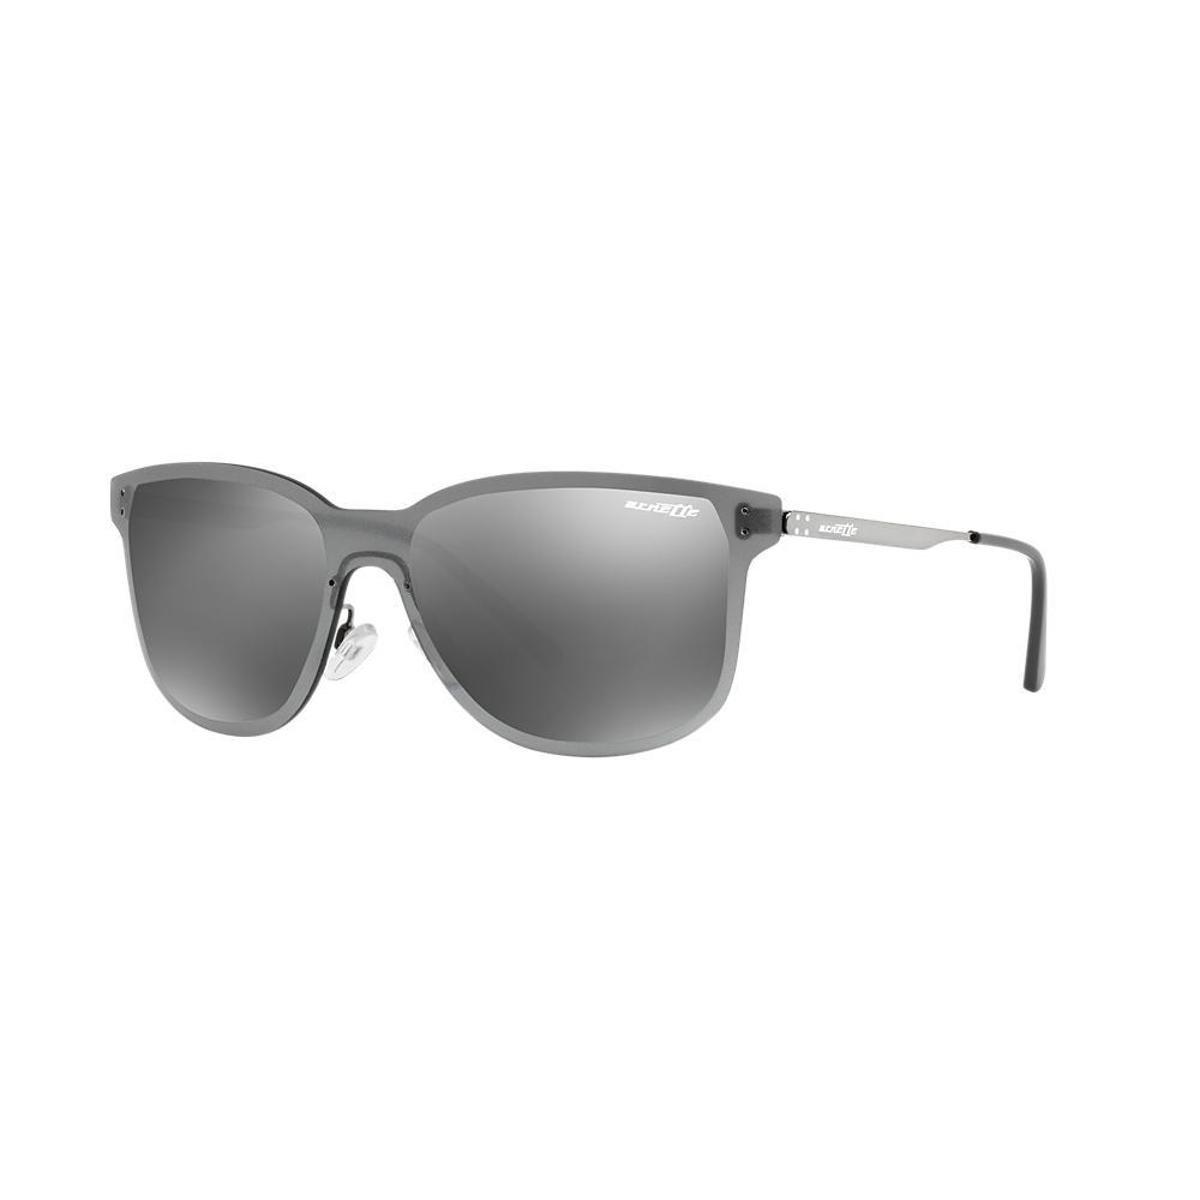 Óculos de Sol Arnette Retangular AN3074 Hundo- P2 Masculino - Chumbo ... 400215362d